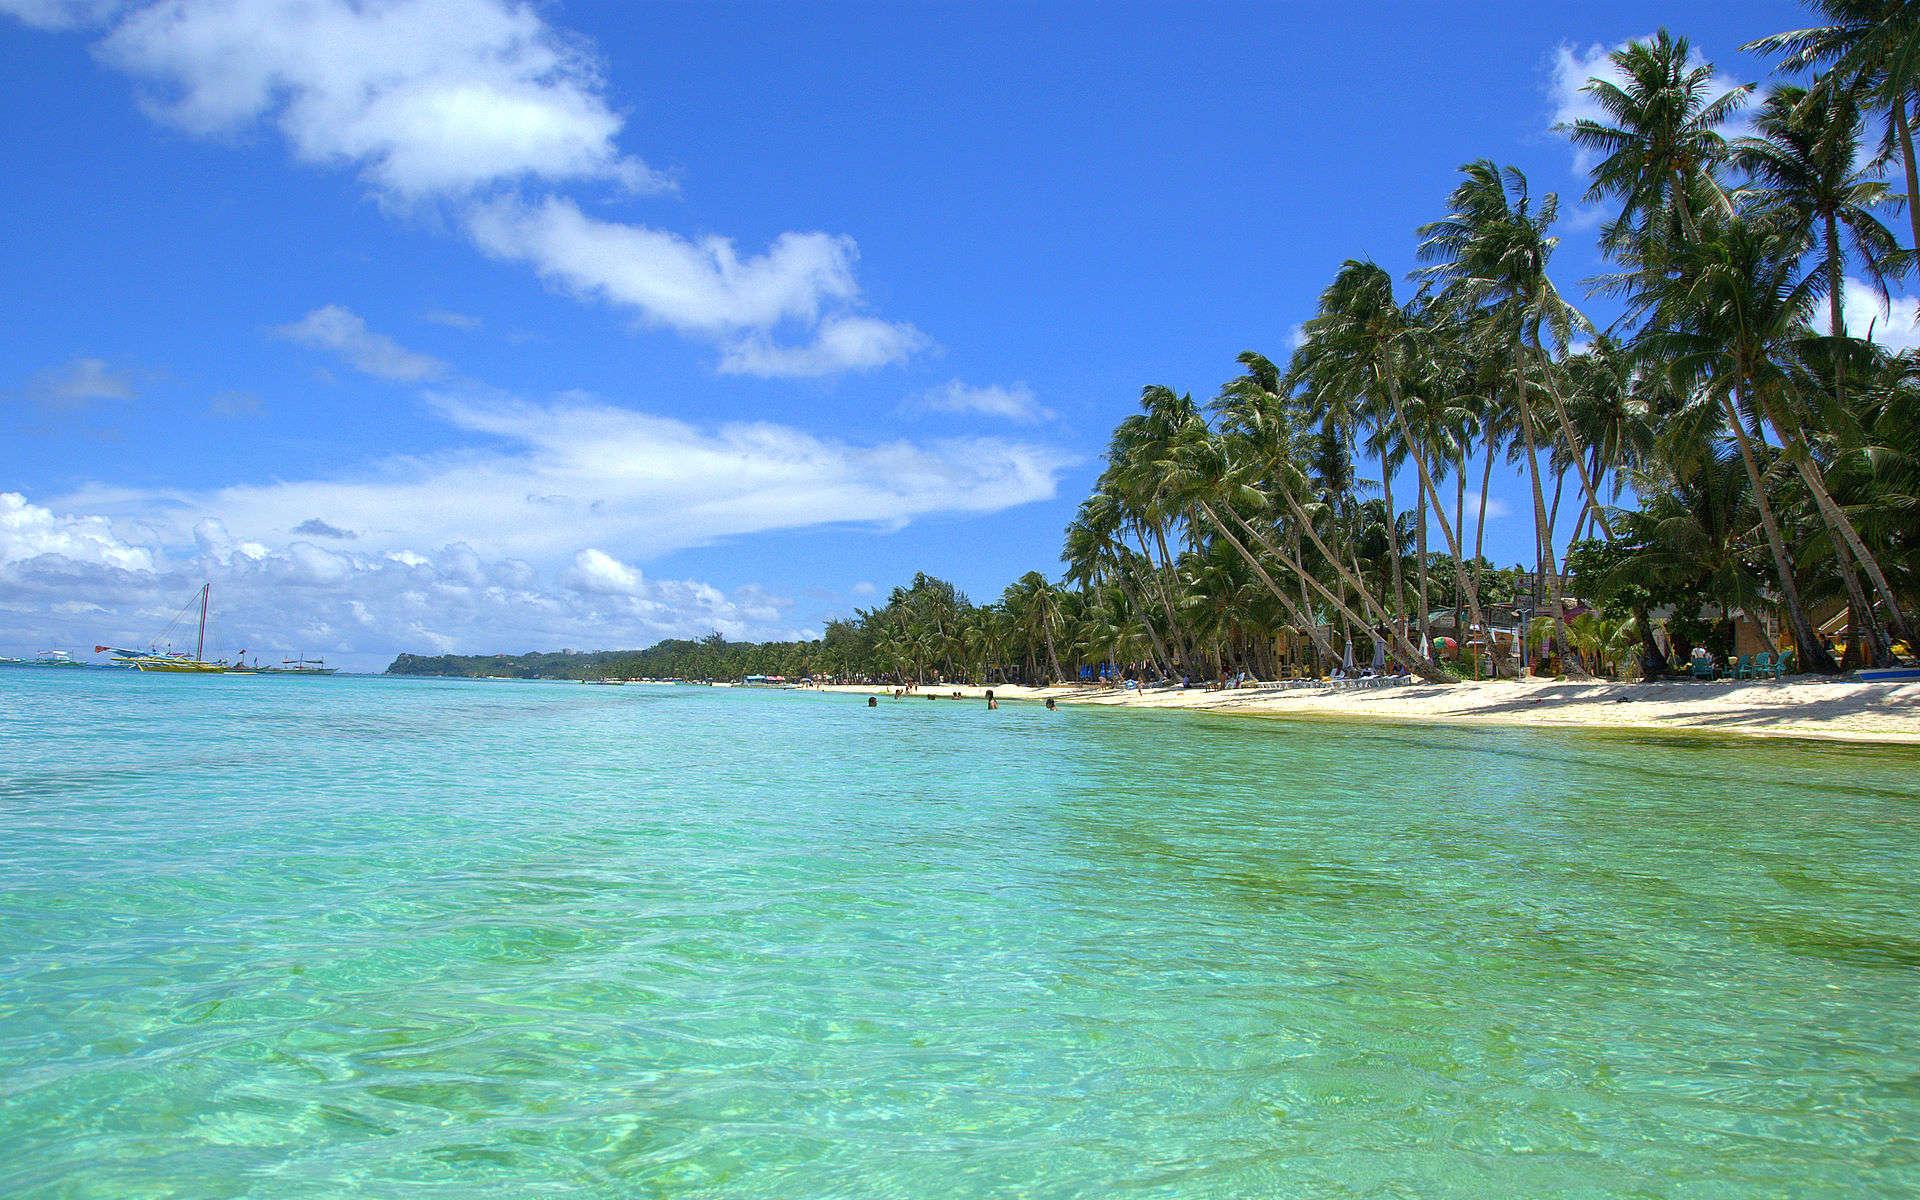 tropical beach wallpaper 06443  Download 1920x1200